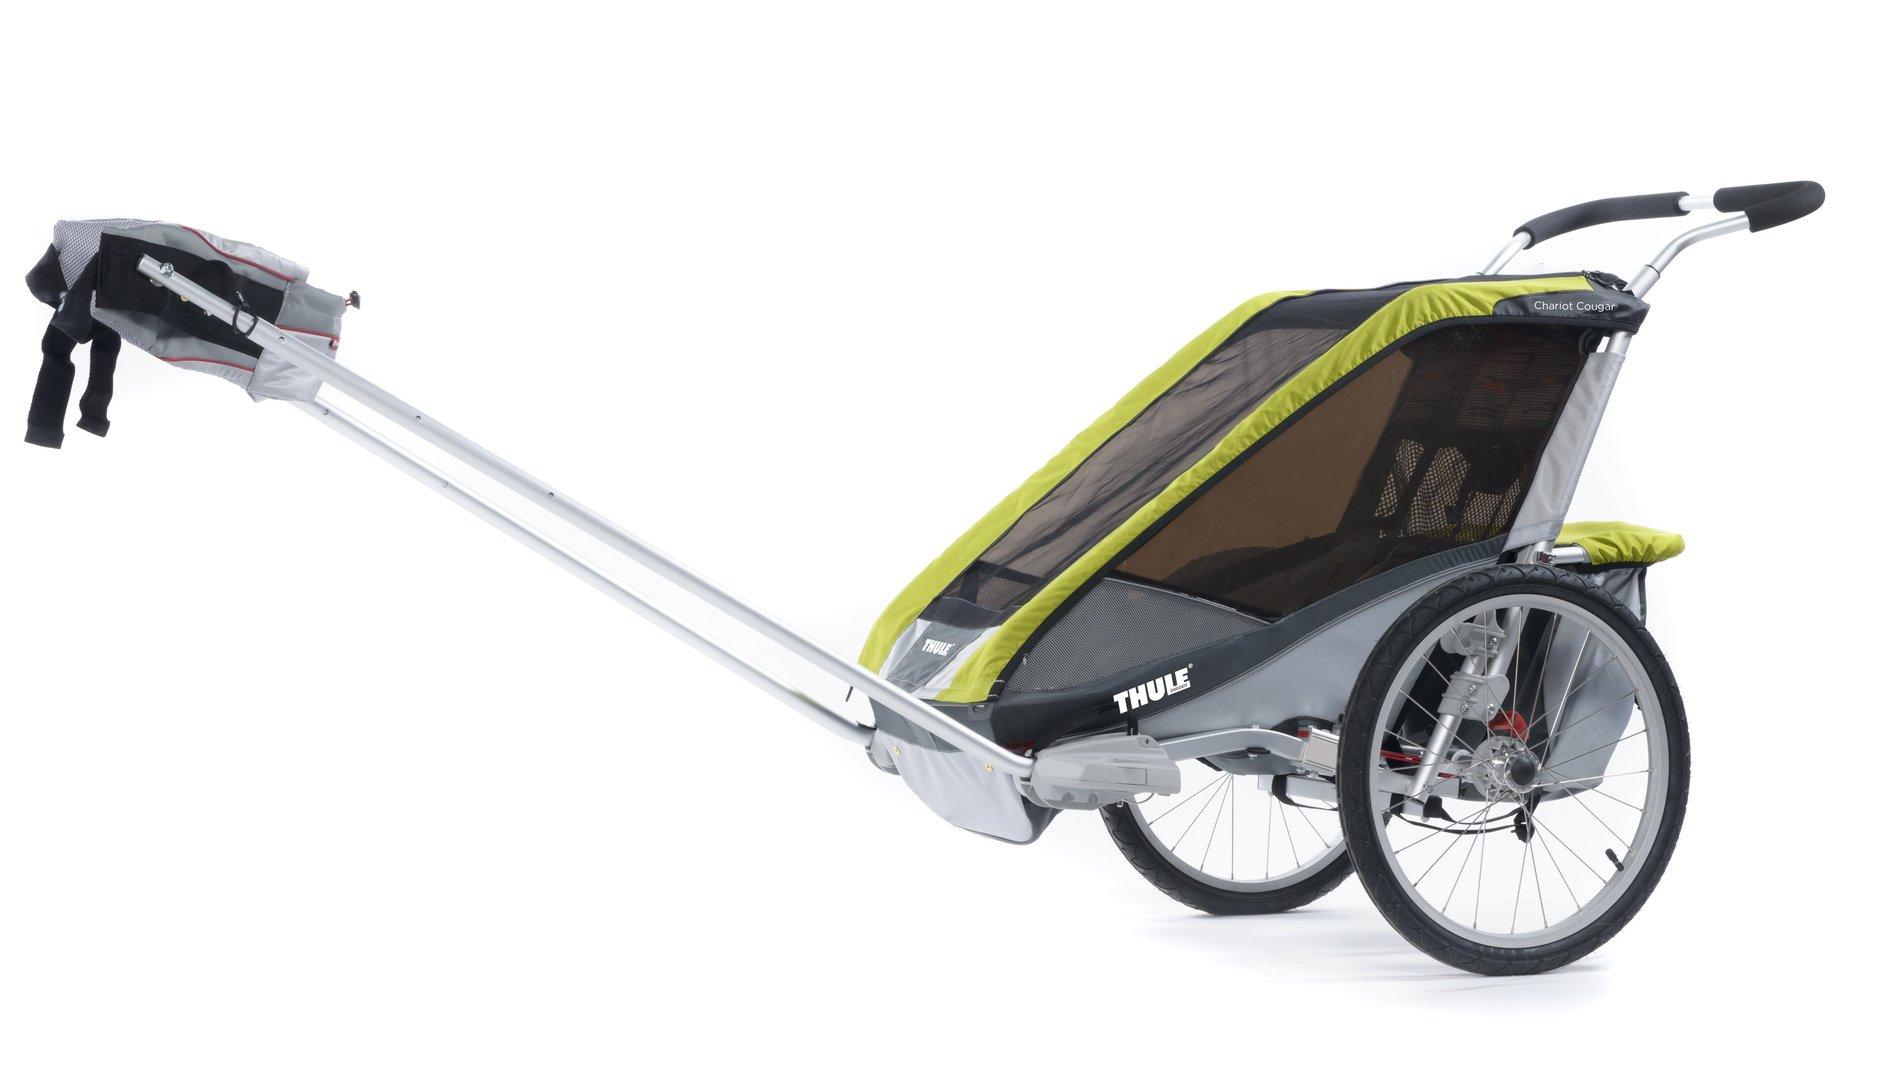 thule chariot cougar 1 2014 2015 avocado grau silber incl. Black Bedroom Furniture Sets. Home Design Ideas